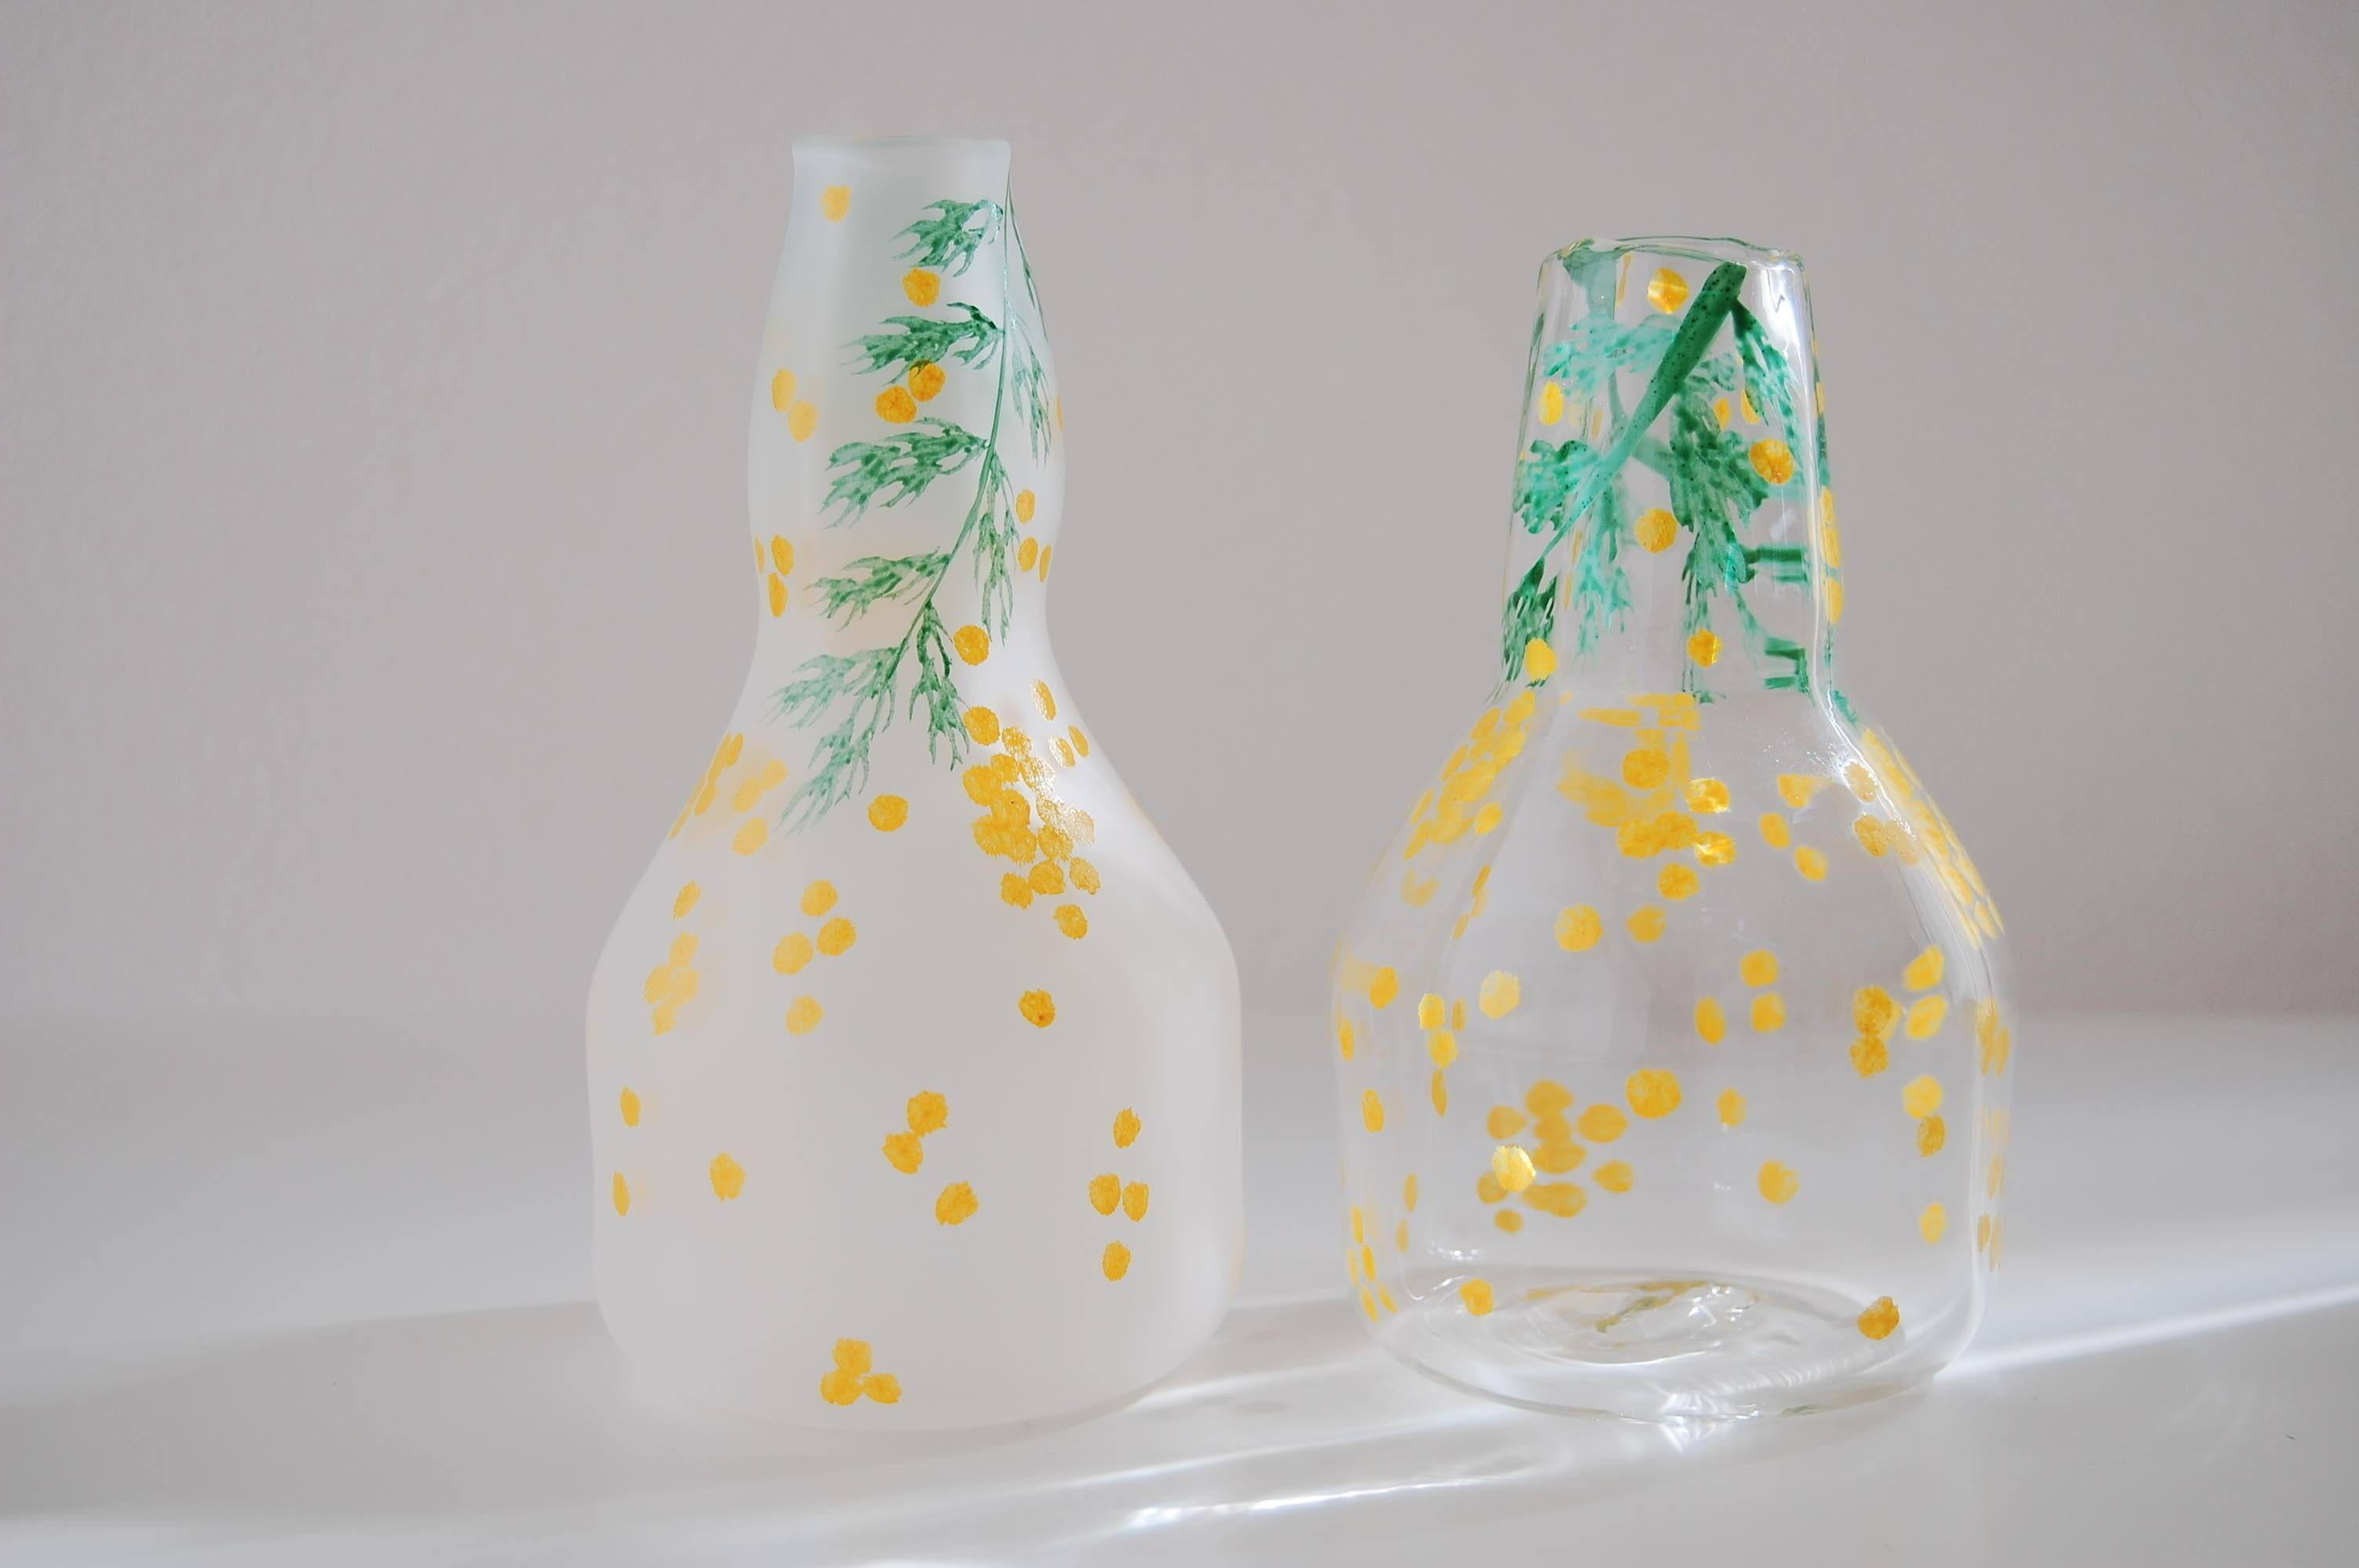 Bocciolo展 中野由紀子さん gardenグラス・豆皿・花器_b0353974_15205352.jpg